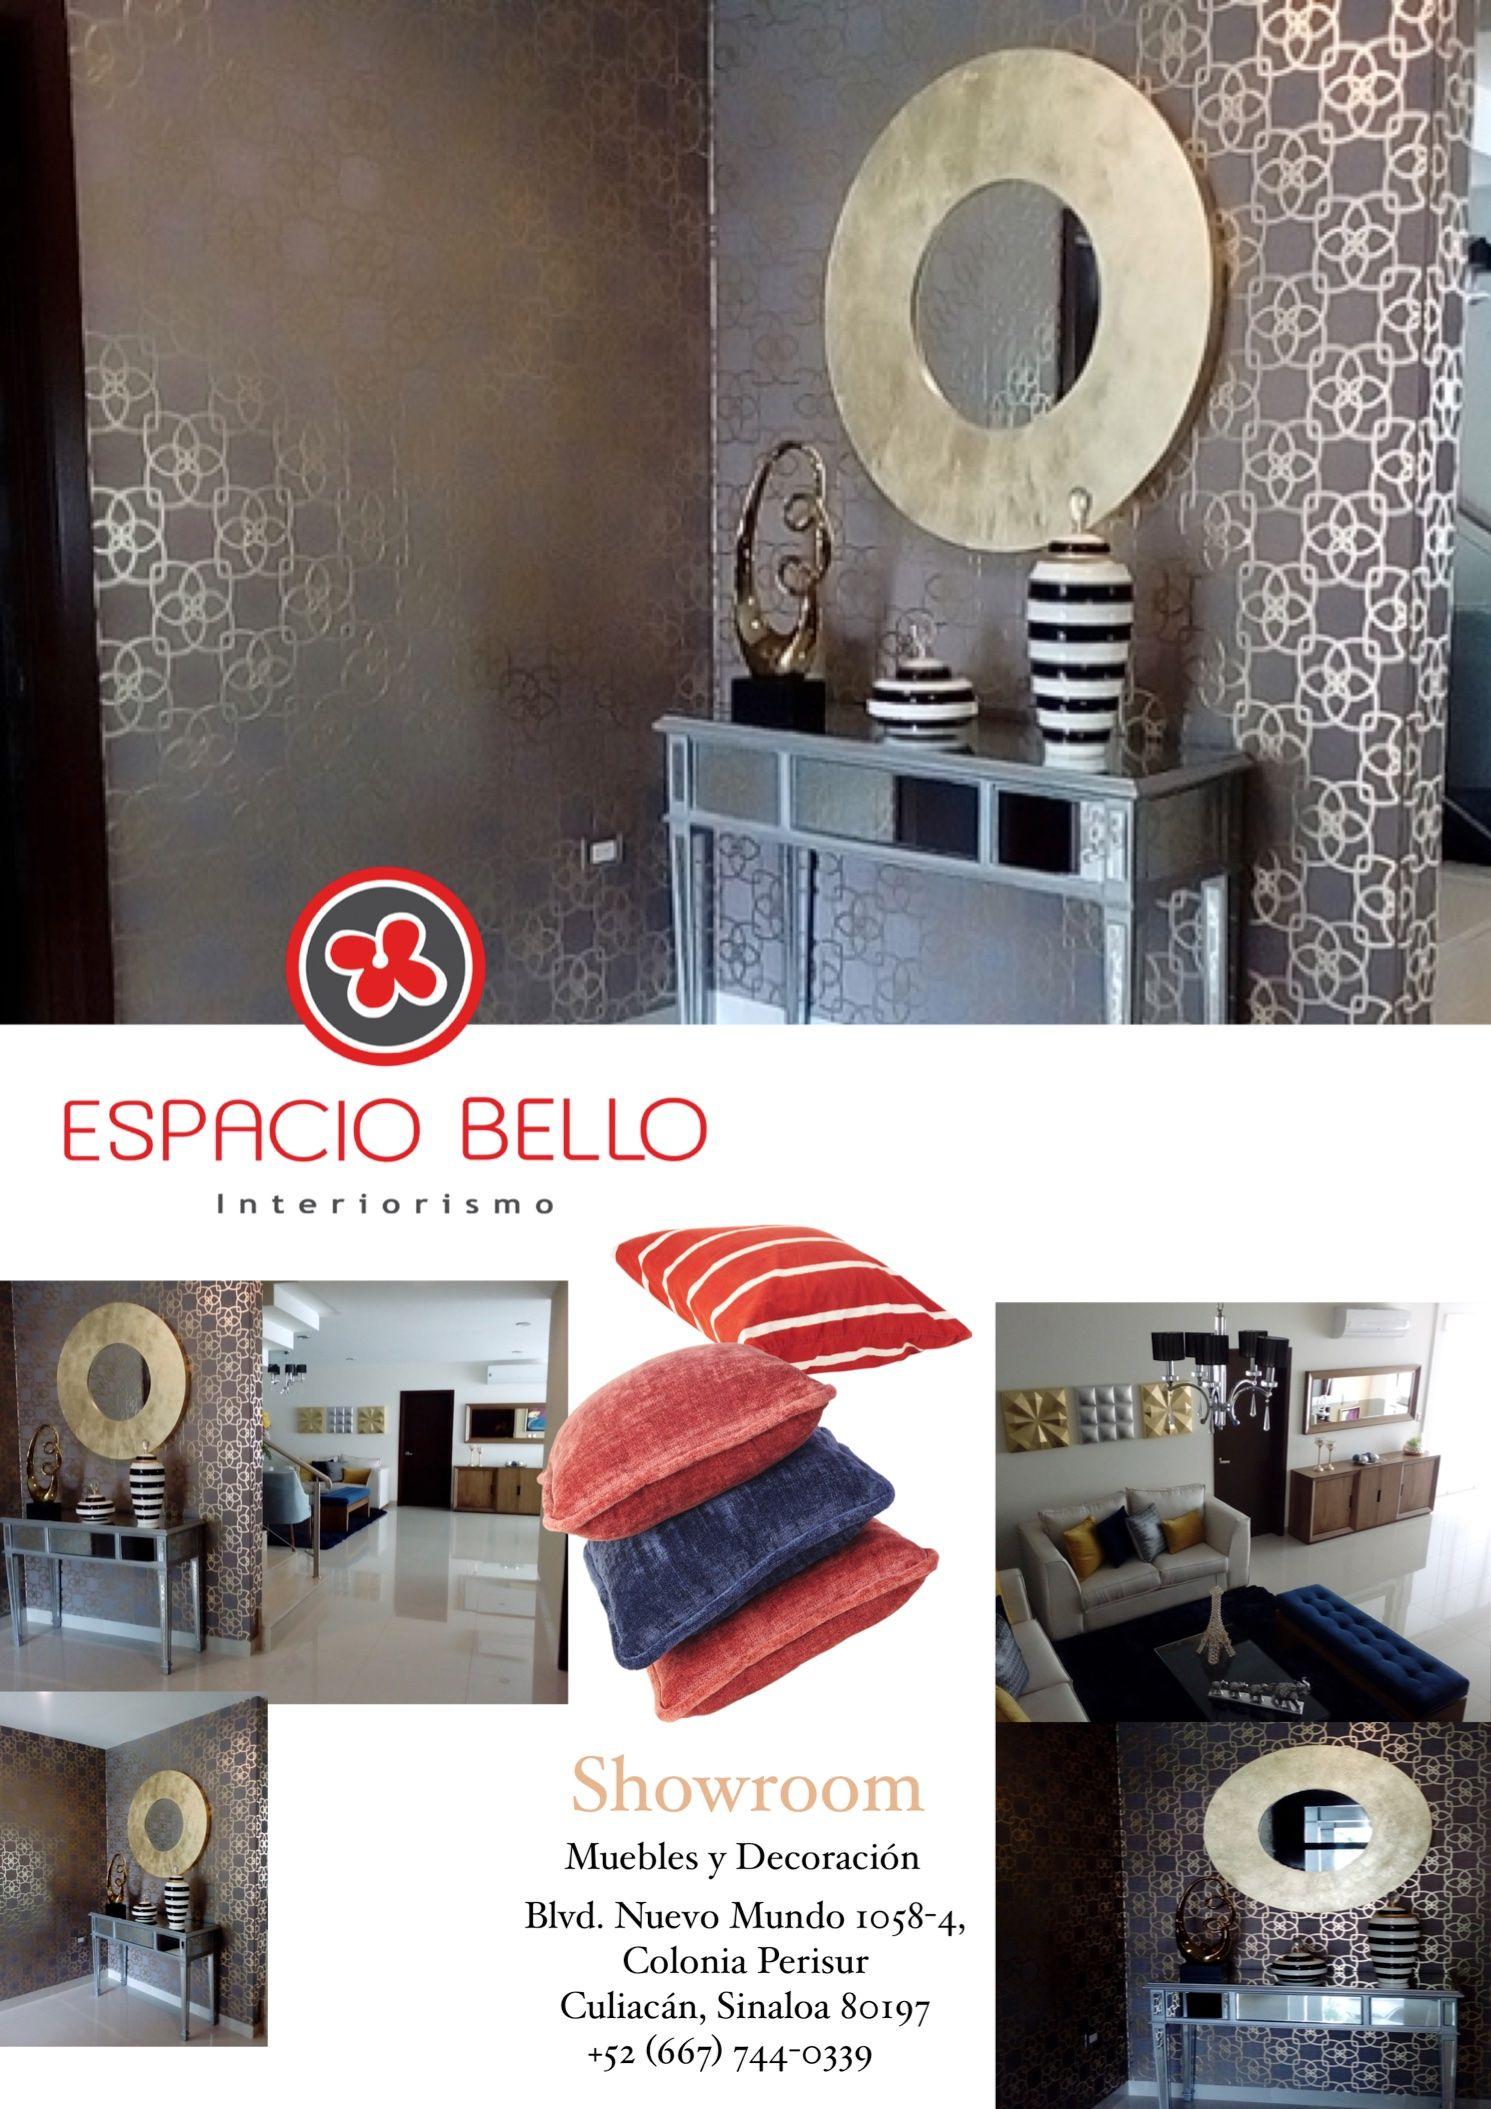 Espacio Bello Muebles E Interiorismo Blvd Nuevo Mundo 1058 4  # Culiacan Muebles Oficina